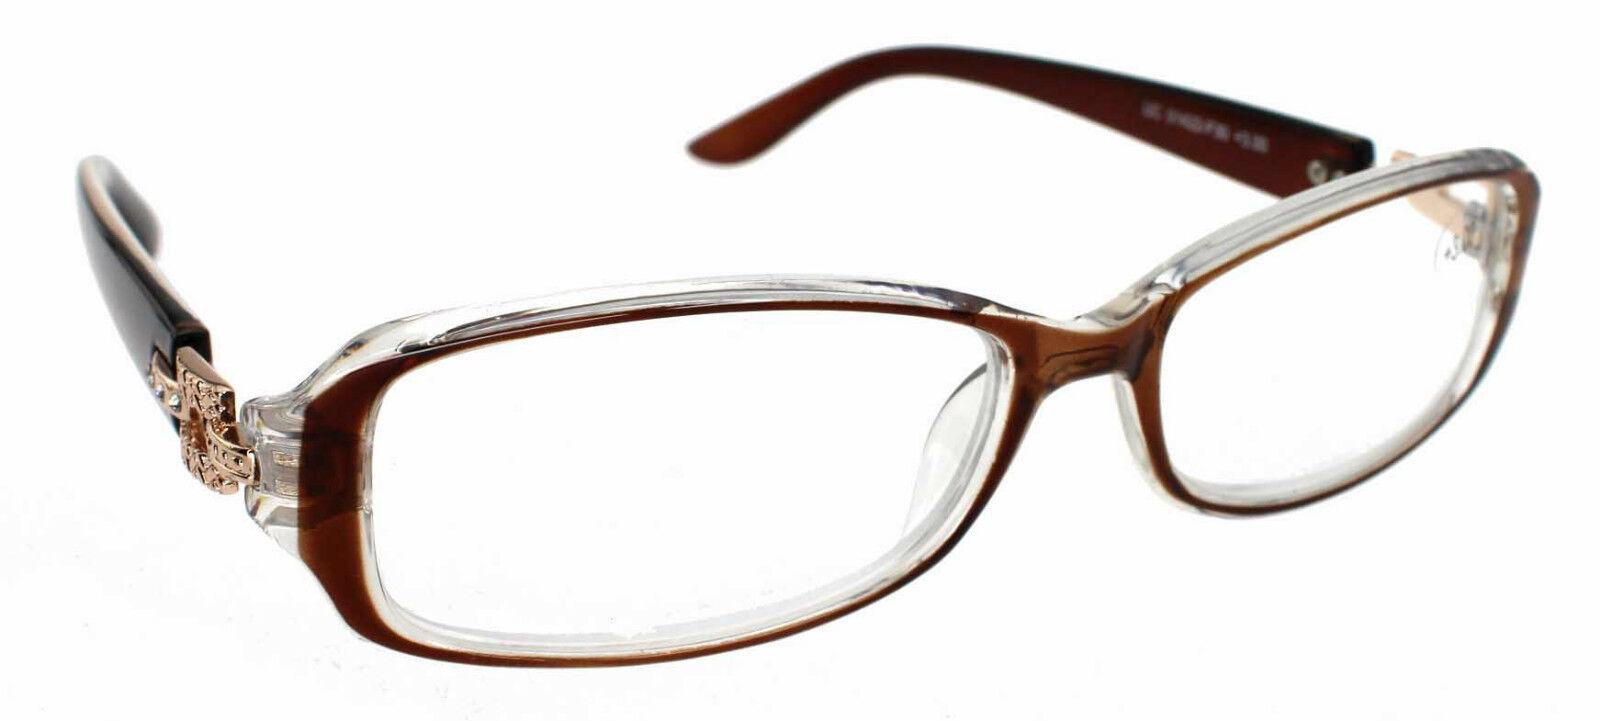 Half Frame Reading Glasses Australia : Mens Ladies Magnifying Reading Glasses Clear Half Frame 1 ...